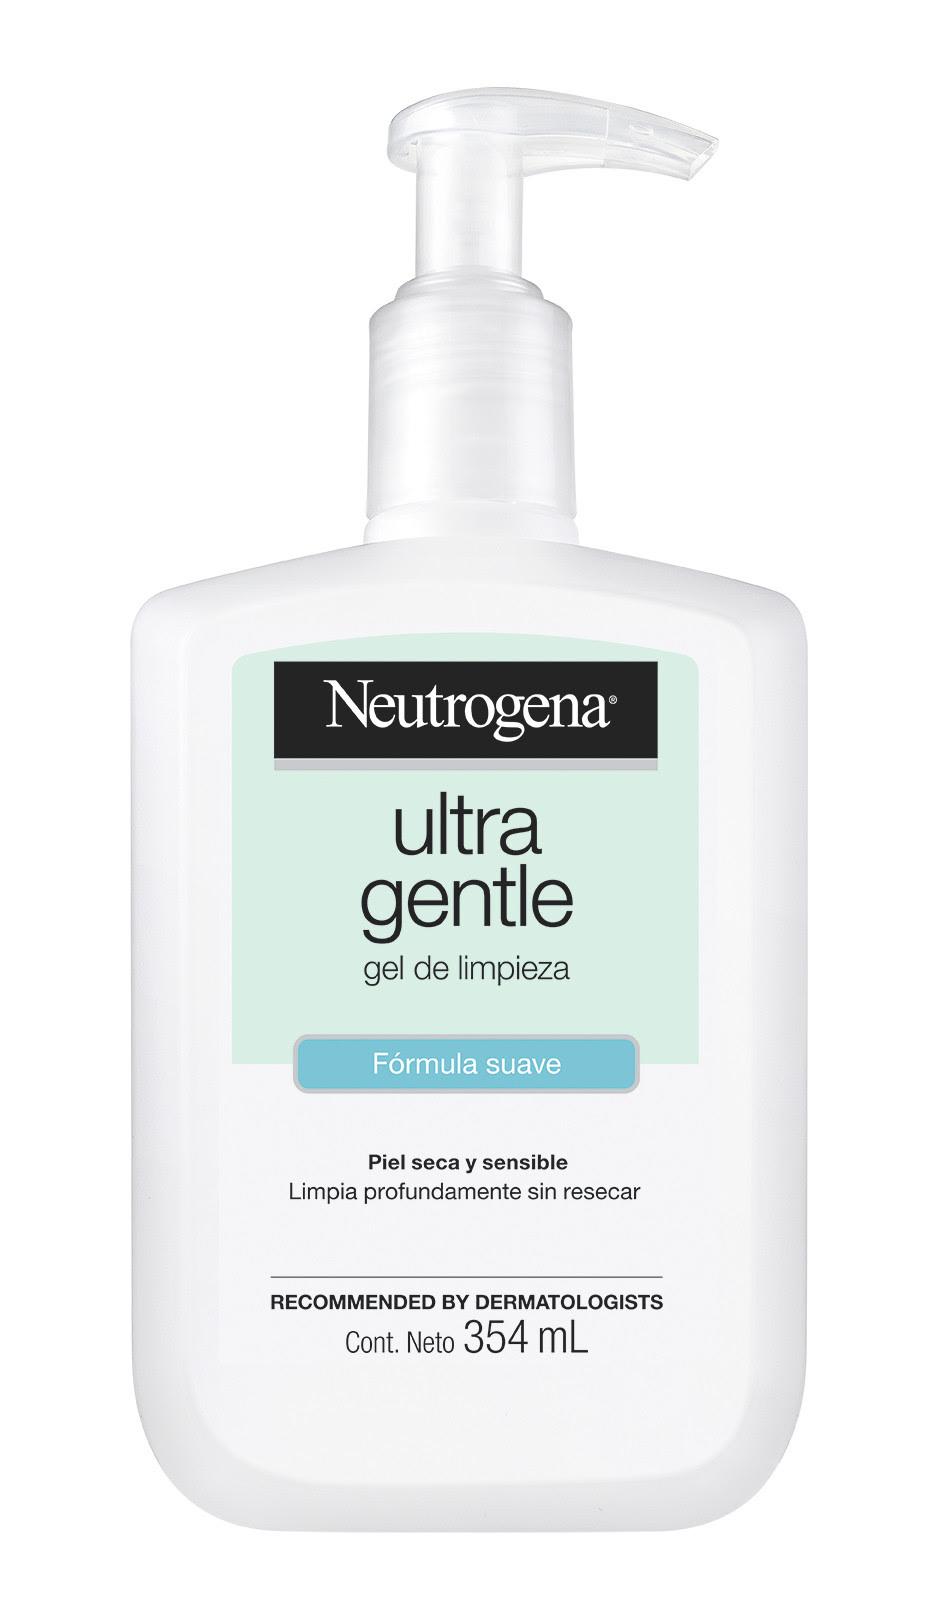 Neutrogena_Ultra_Gentle_SIN_ESPUMA_BAJA.jpg